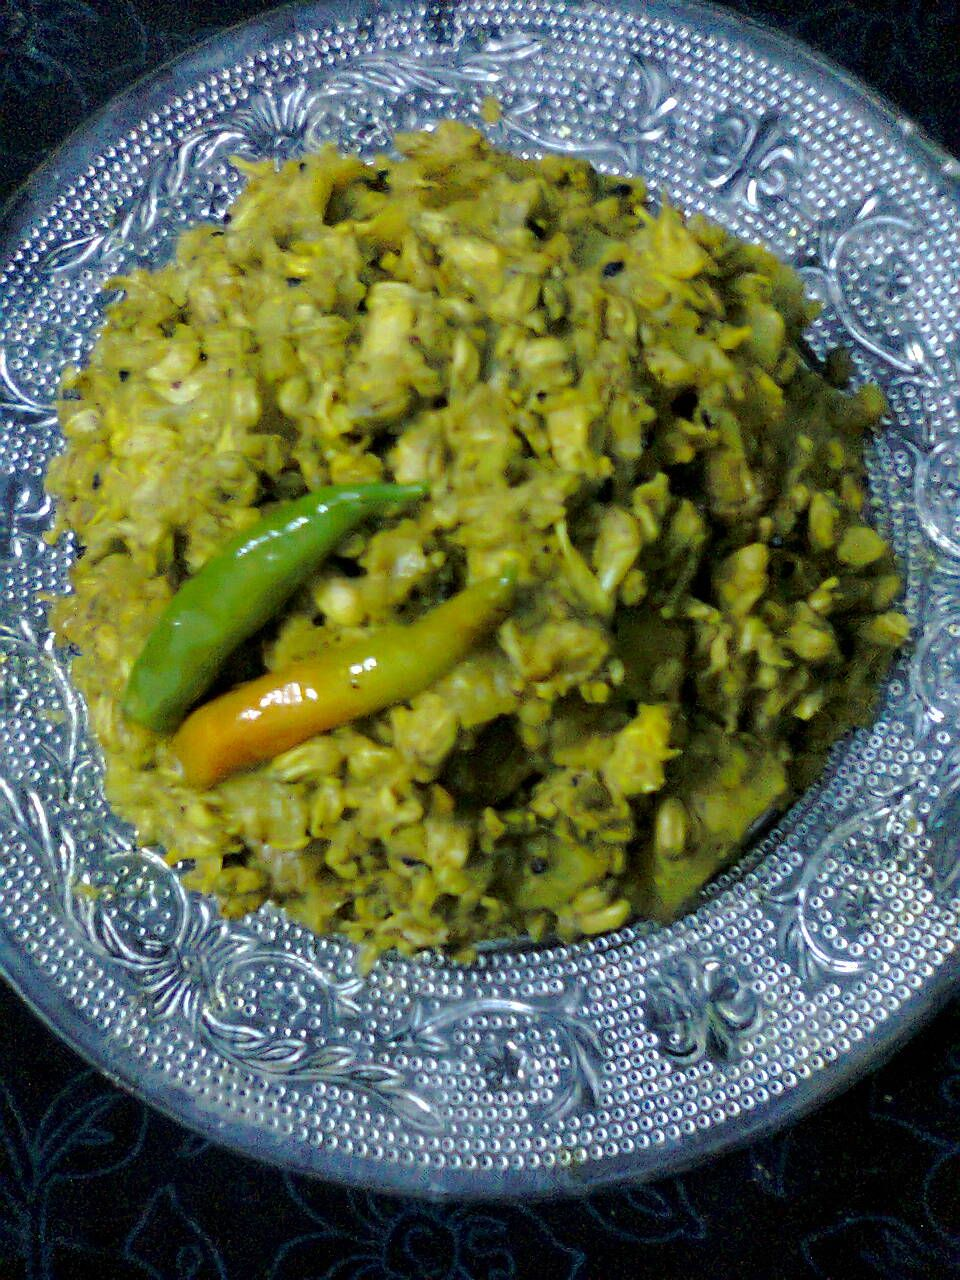 Vegetarian Side Dish Drumstick Flowers Curry Sojne Fuler Torkari Recipe Vegetarian Side Dishes Vegetarian Sides Side Dishes